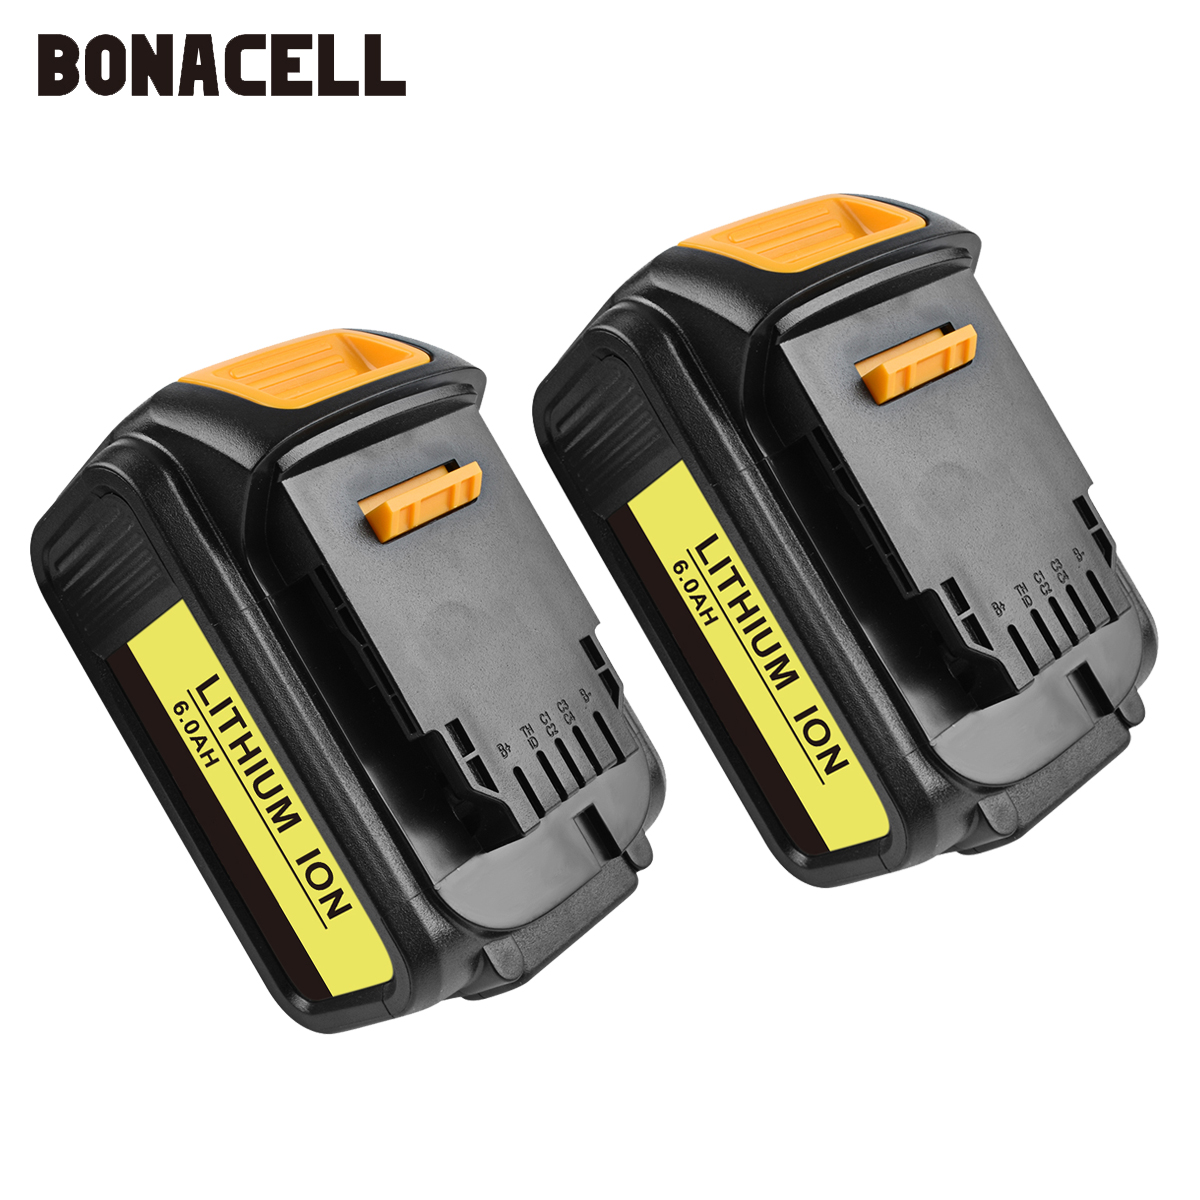 Батарейка Bonacell для электроинструментов DeWalt, 18 в, 6000 мАч, Замена батарейки MAX XR DCB181 DCB182 DCD780 DCD785 DCD795 L70